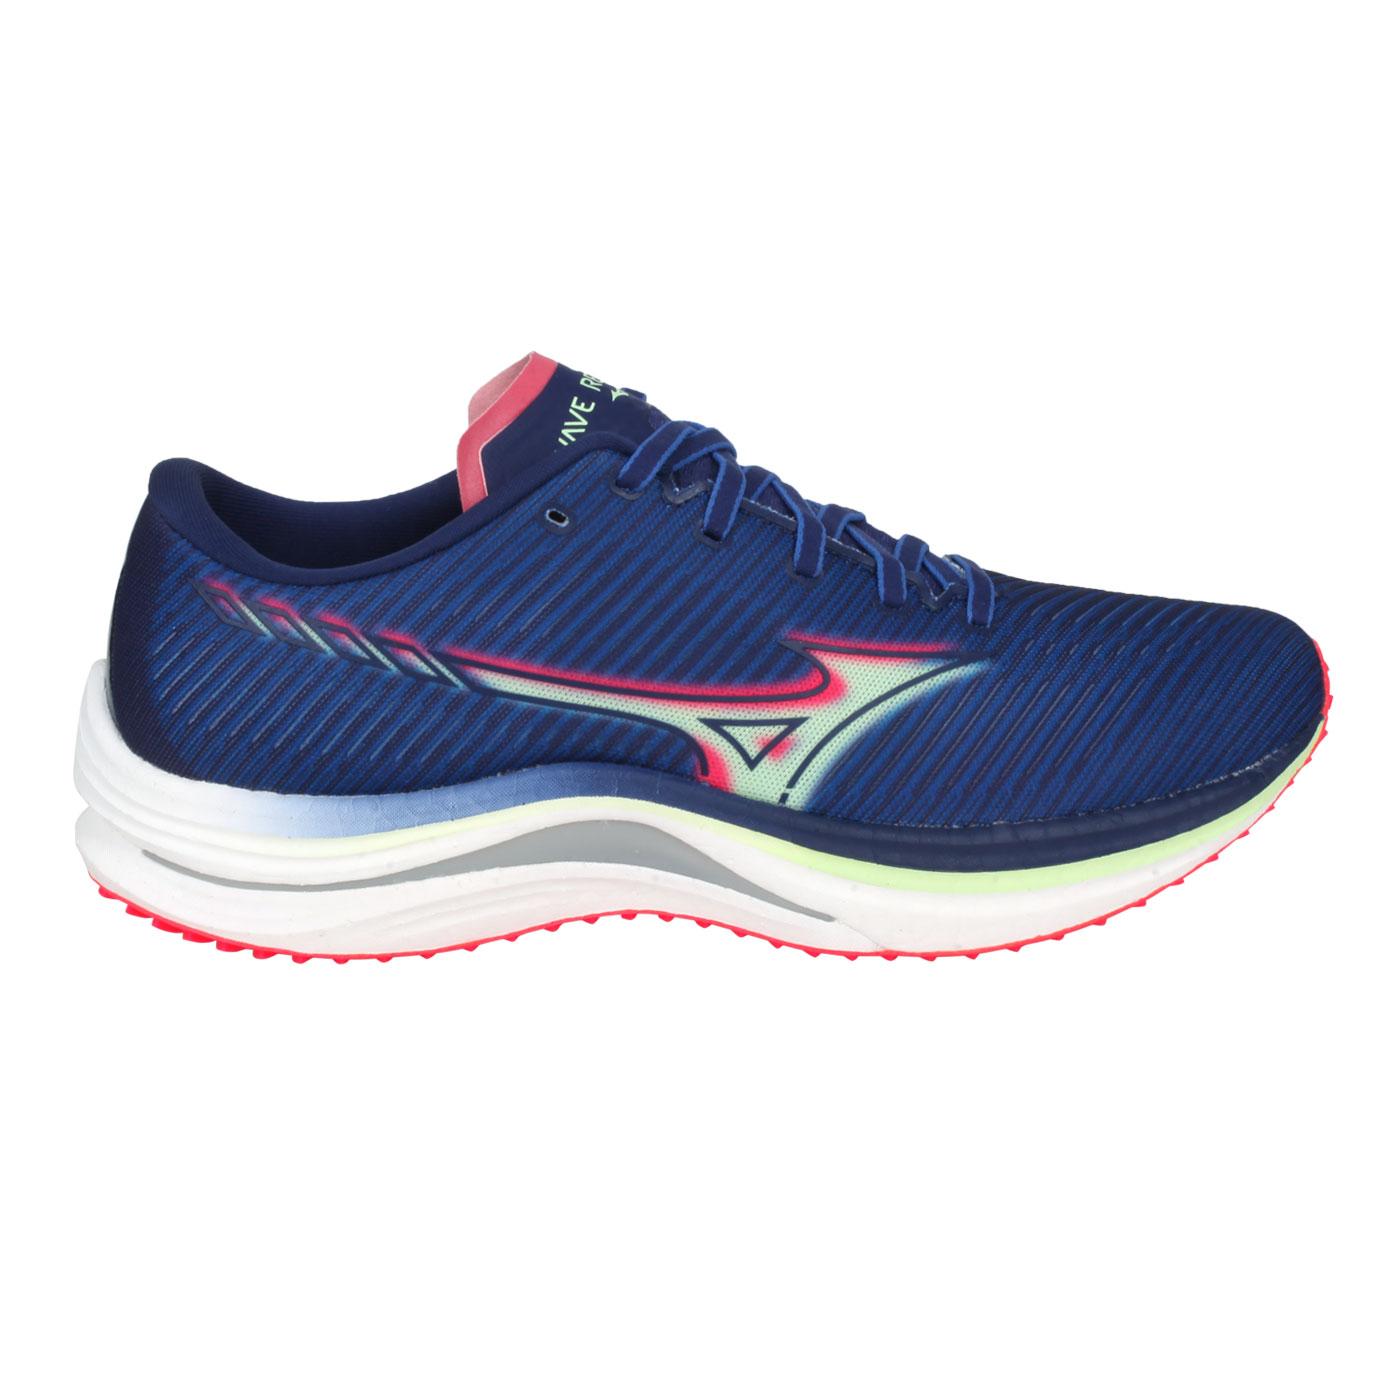 MIZUNO 男款路跑鞋  @WAVE REBELLION@J1GC211783 - 藍綠紅